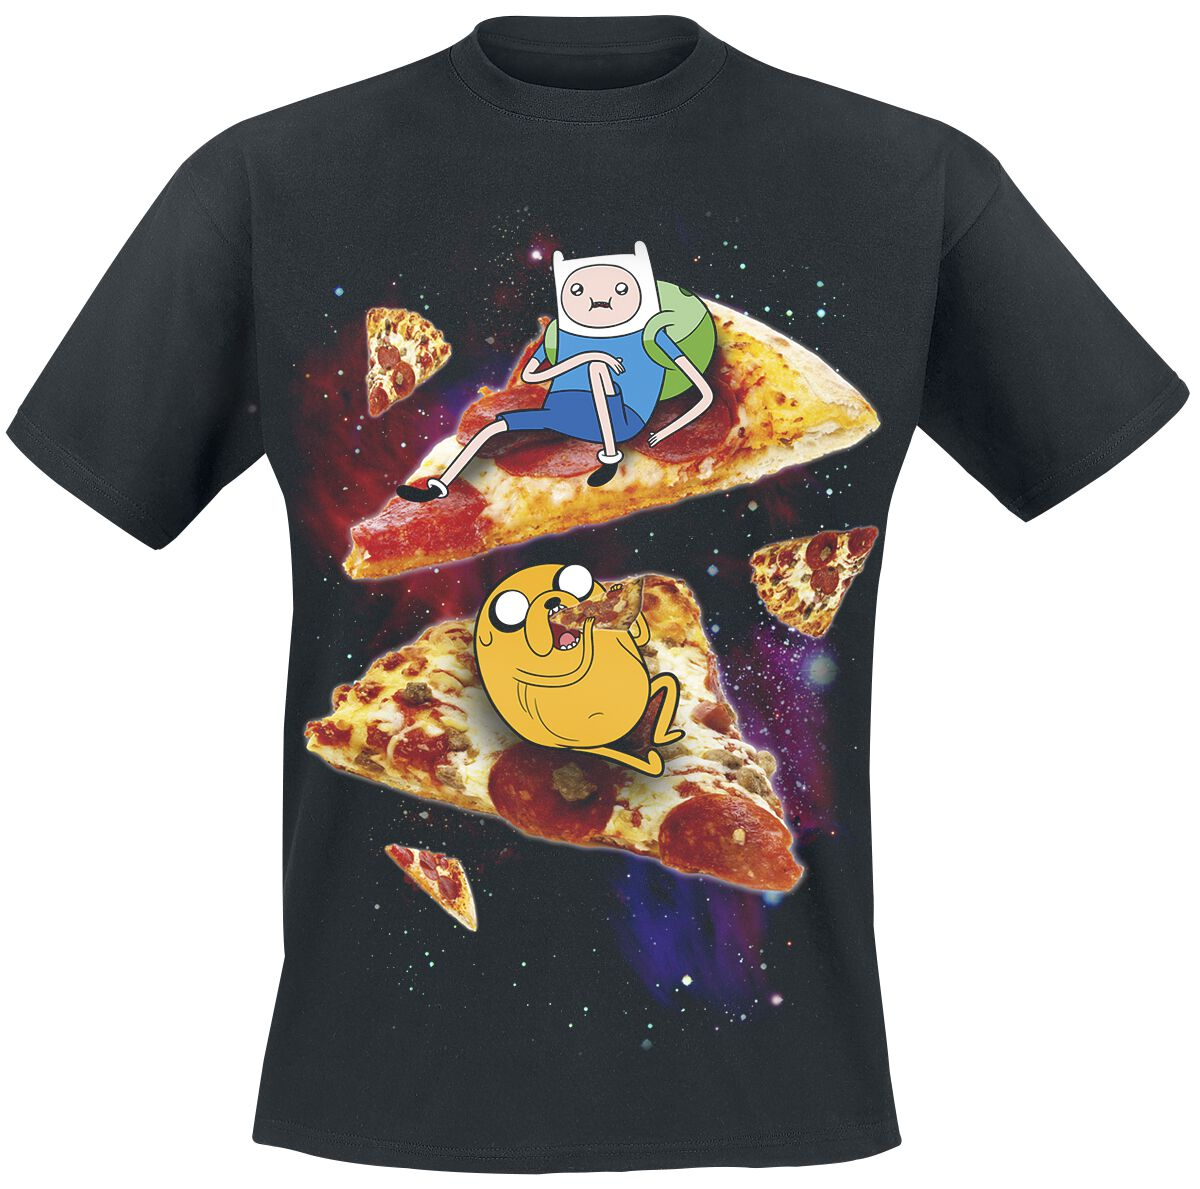 Merch dla Fanów - Koszulki - T-Shirt Adventure Time Finn & Jake Pizza T-Shirt czarny - 311374